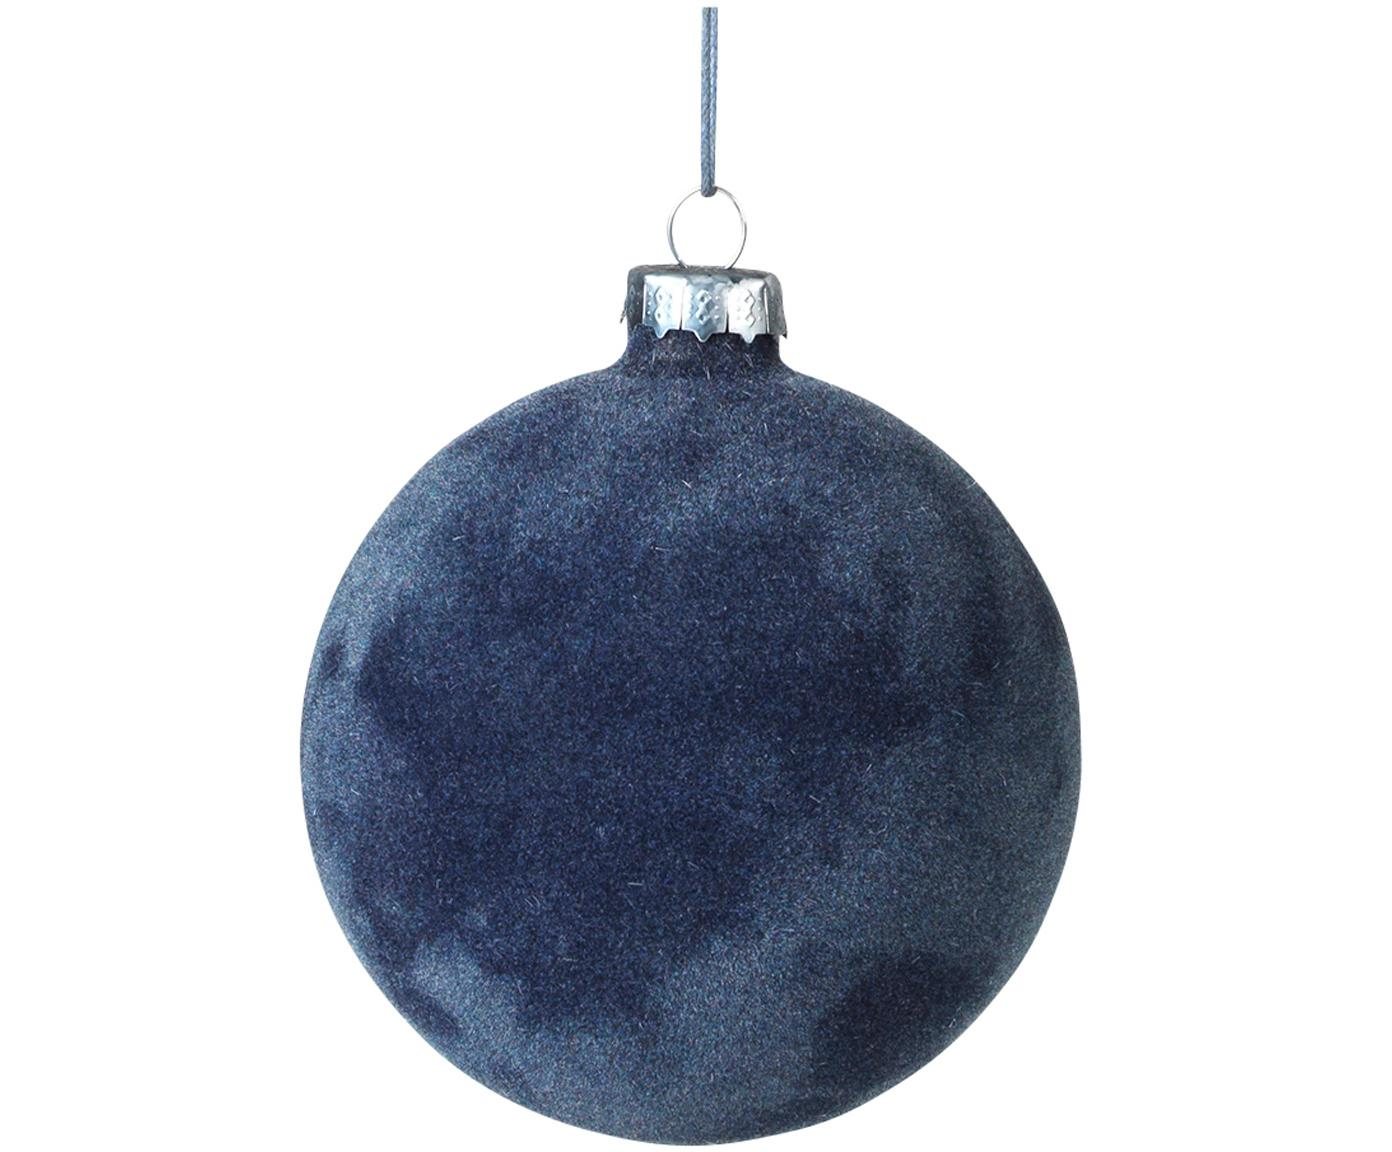 Weihnachtskugeln Alcan Ø10cm, 3Stück, Glas, Polyestersamt, Dunkelblau, Ø 10 cm